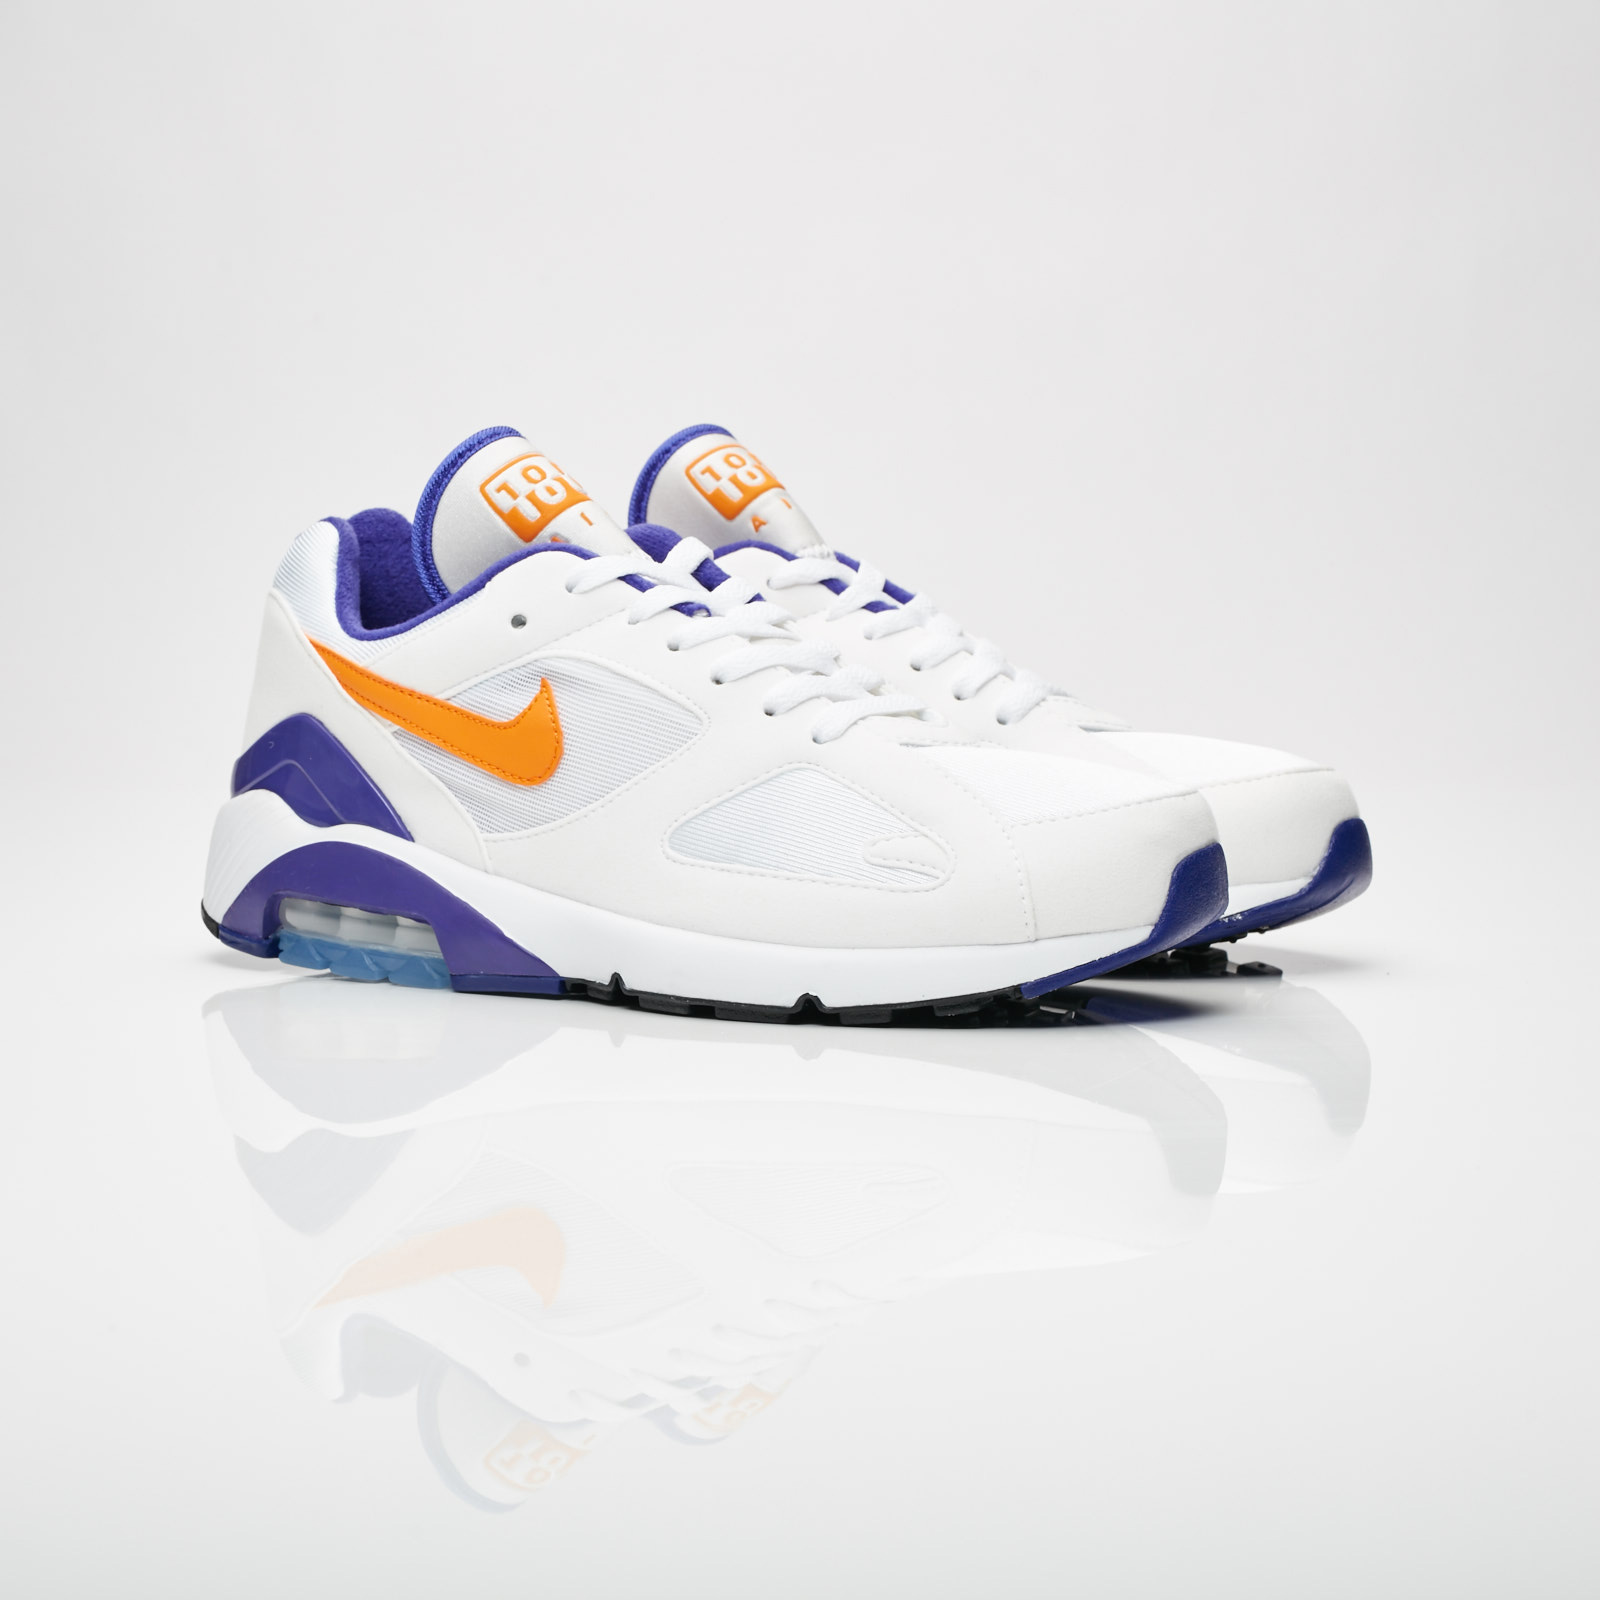 426e9c16b20bfd Nike Air Max 180 - 615287-101 - Sneakersnstuff